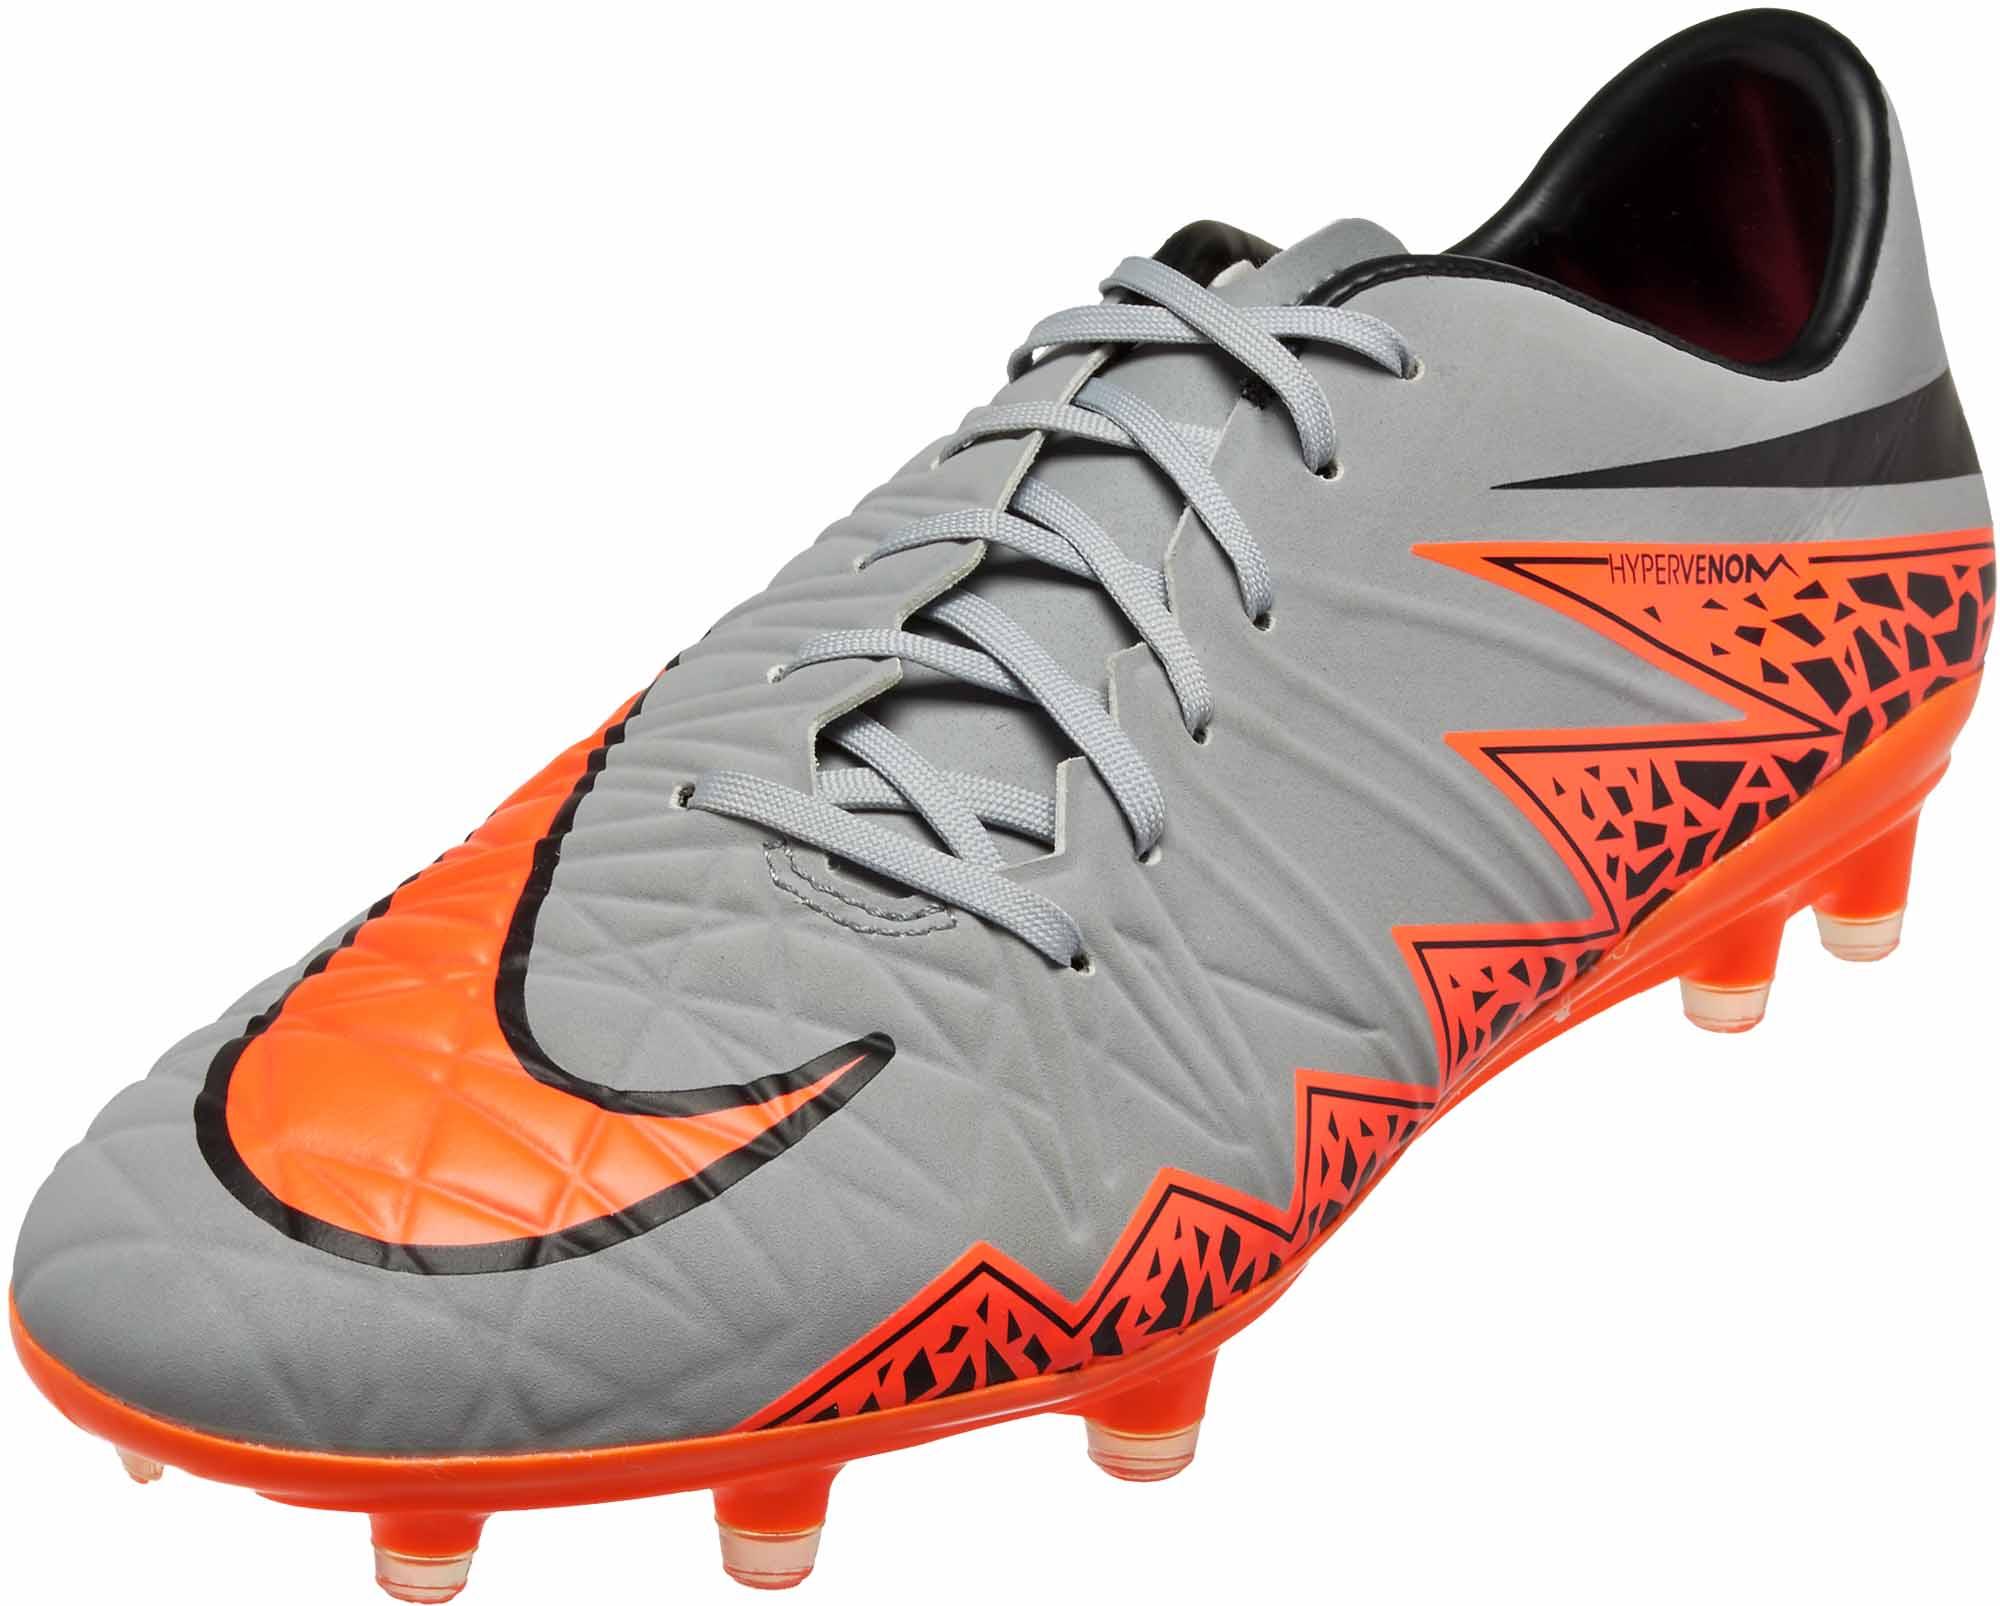 detailed look dbf21 03f51 Nike Hypervenom Phatal II FG Soccer Cleats – Grey/Black